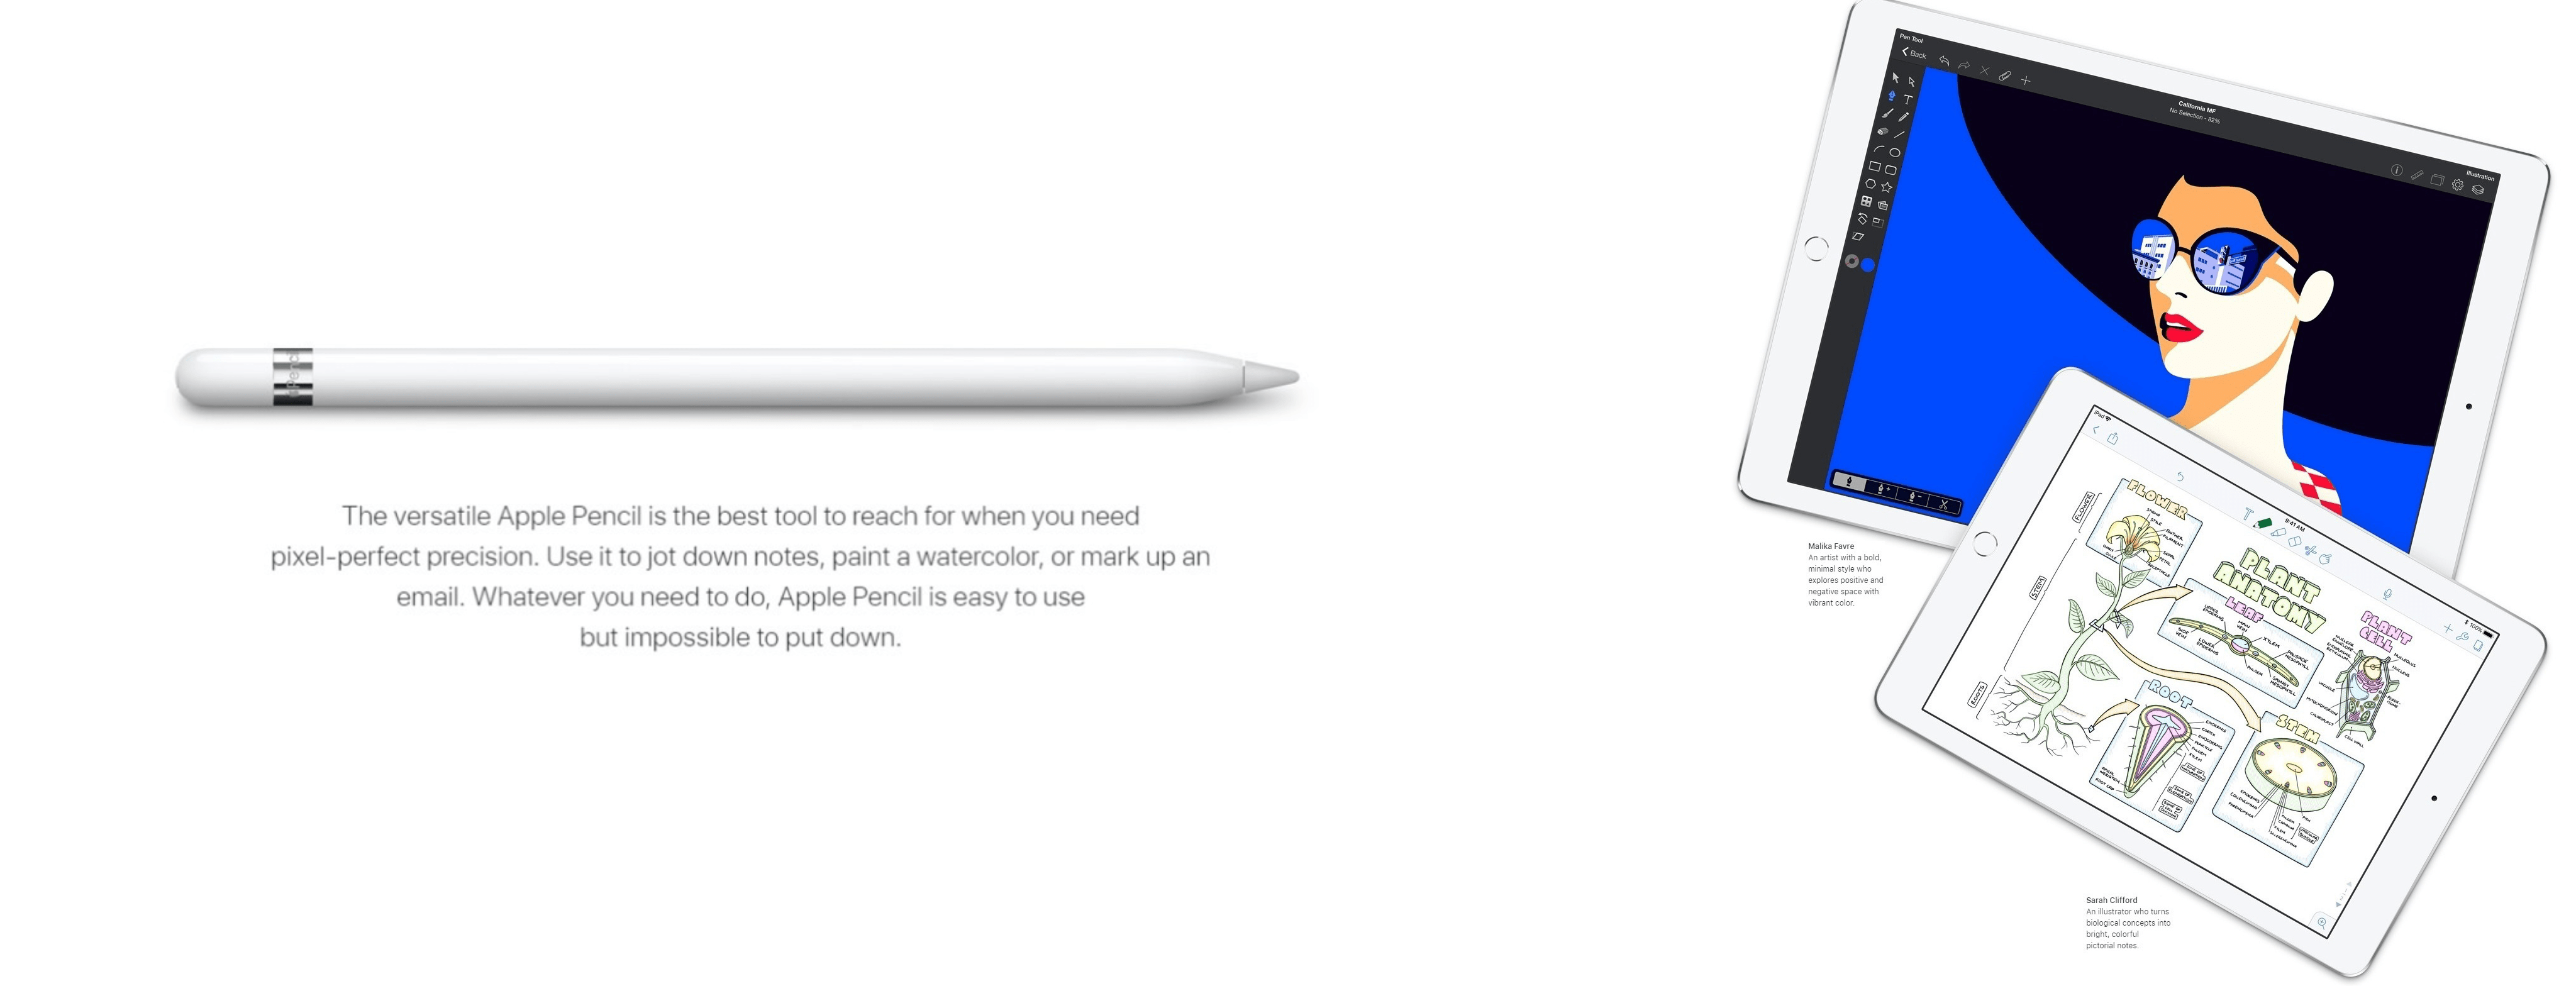 Apple Pencil - AP2MK0C2 | Buy Online | Ubuy Kuwait